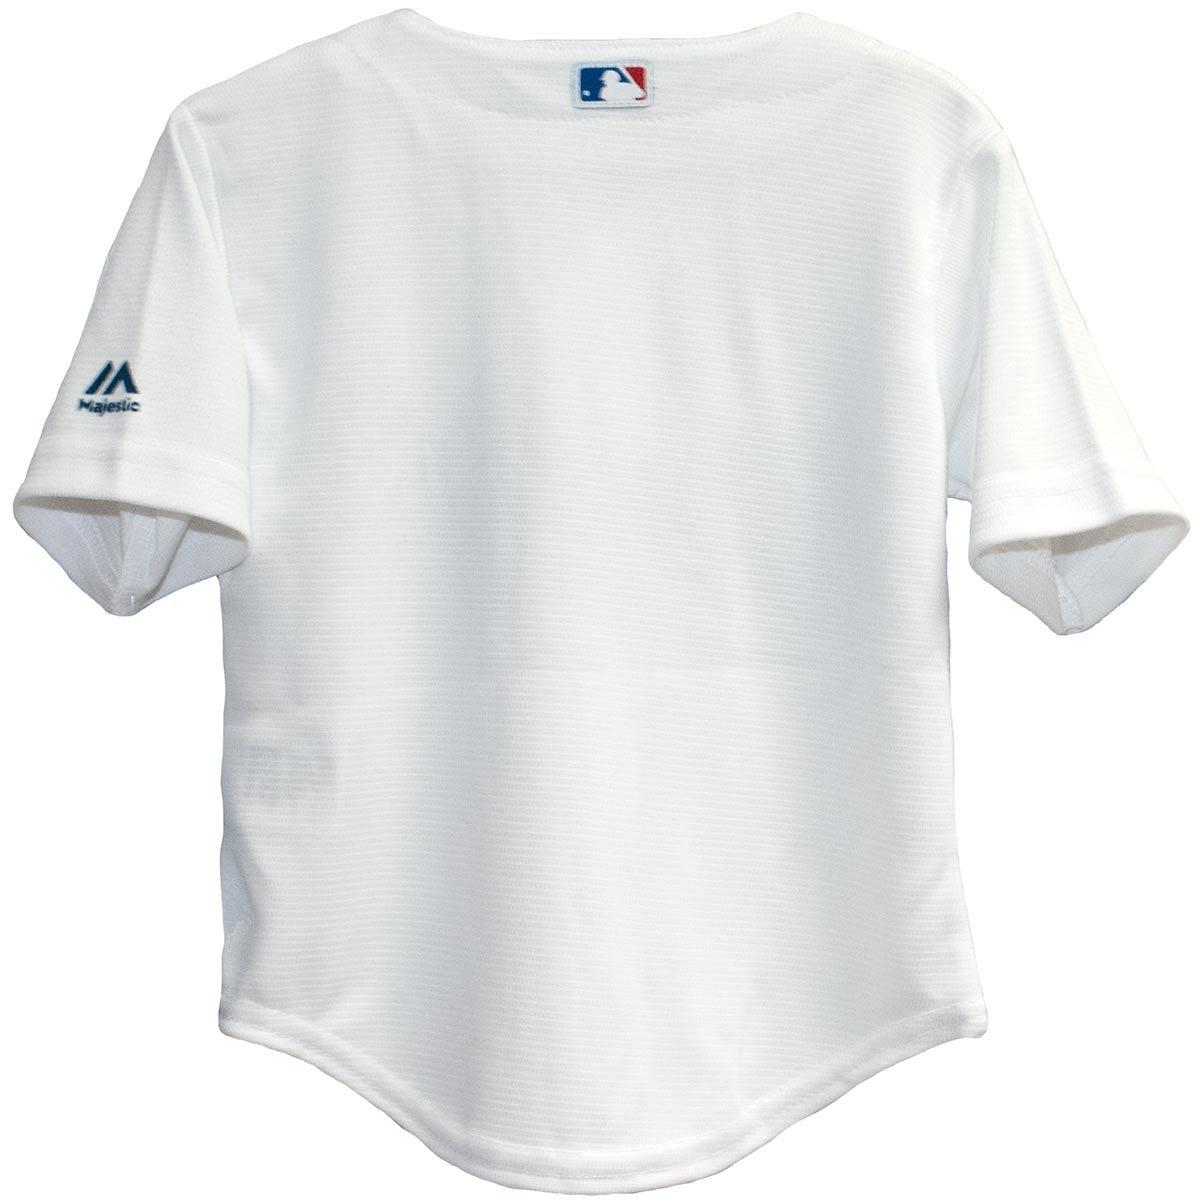 a4d02a7d949 Amazon.com   Majestic Toddler Home Replica Jersey - LA Dodgers - 3T   Sports    Outdoors